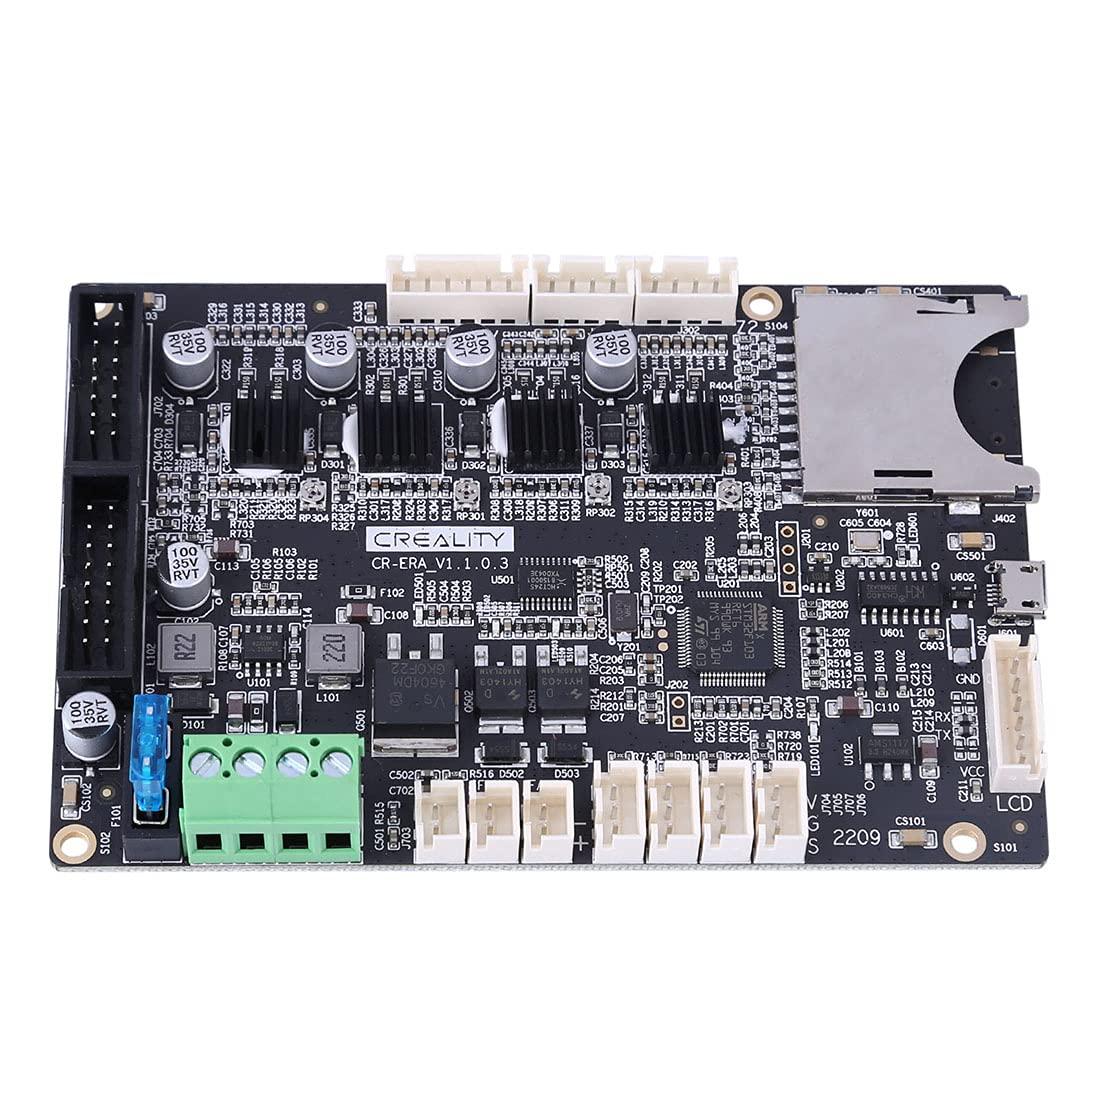 Creality CR-6 SE ترقية مجلس الصامت 32 بت لوحة الأم الصامتة لوحة تحكم ل CR-6 ماكس CR-6 SE ثلاثية الأبعاد جزء الطابعة